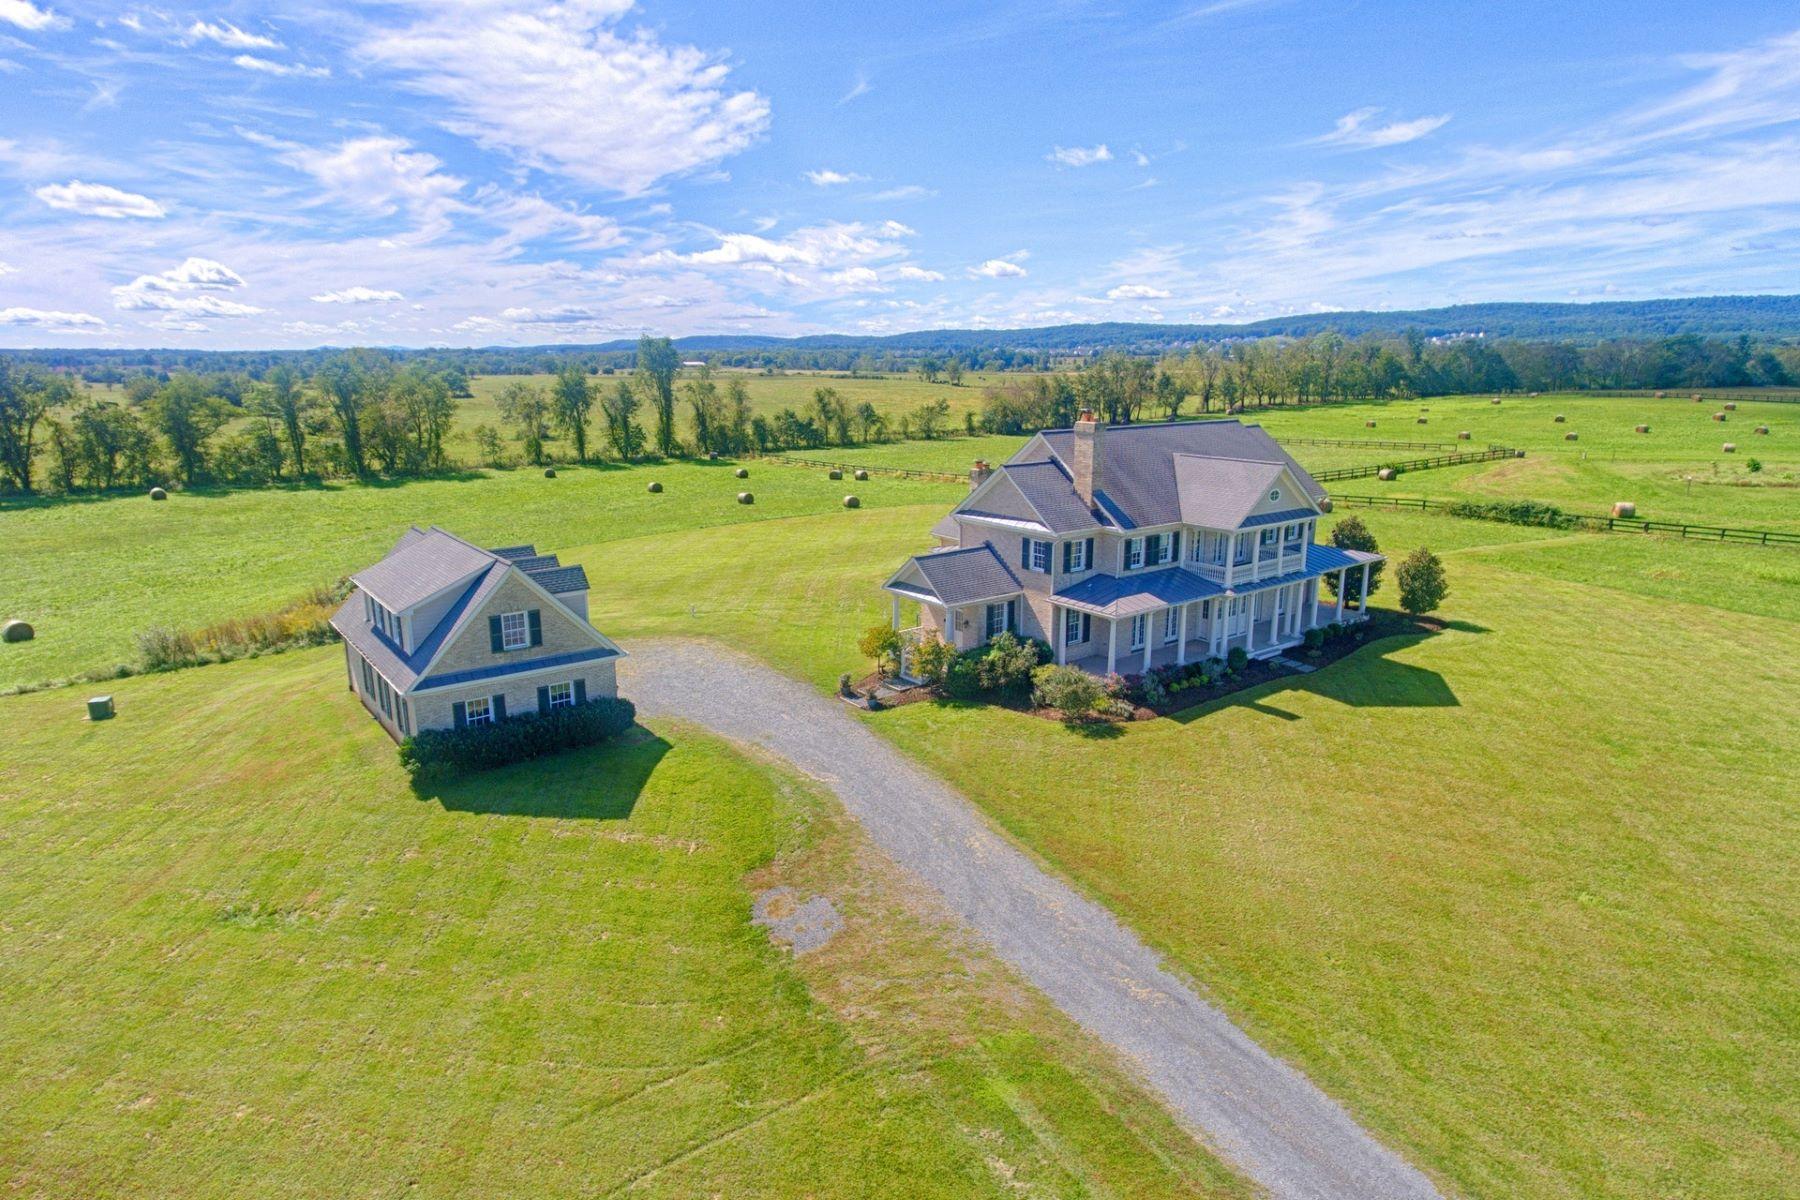 Single Family Home for Sale at Lees Crossing 42779 Travelers Run Lane Leesburg, Virginia 20176 United States